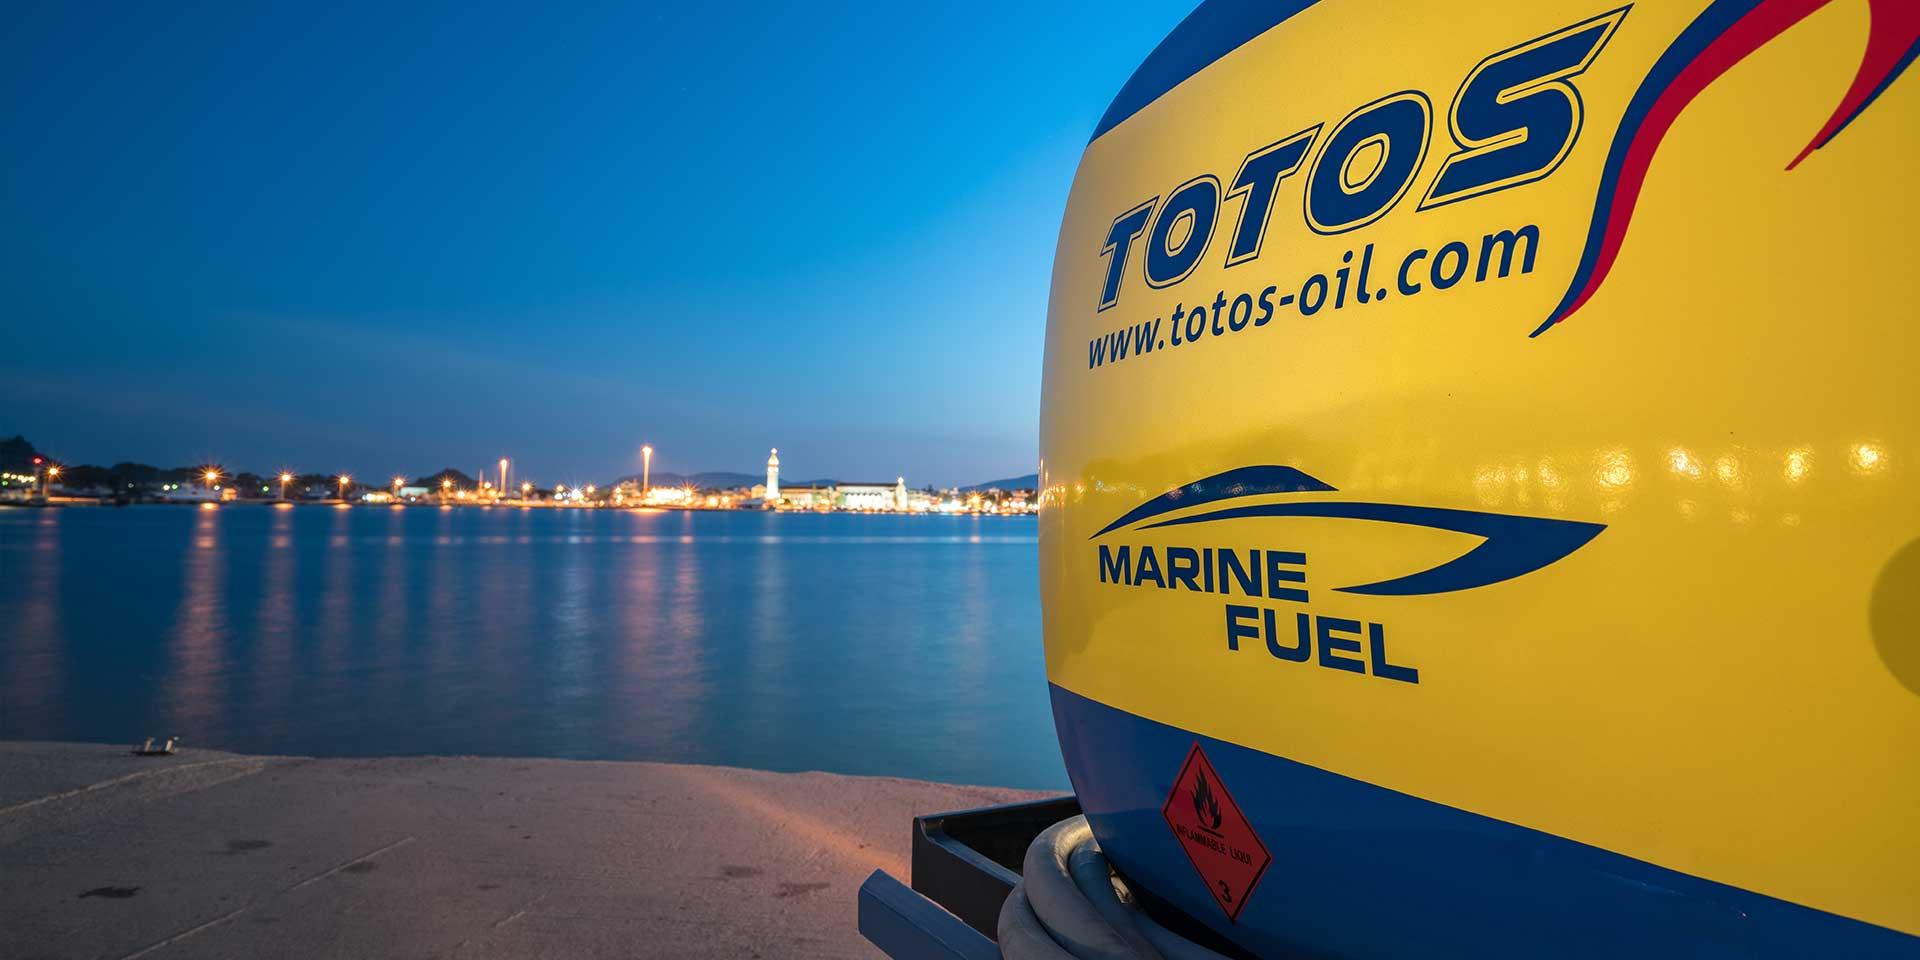 Totos Oil - 24 hour Gas station in Zakinthos | Diesel fuel distribution in Zante - 24 ωρο βενζινάδικο στην Ζάκυνθο | Διανομή πετρελαίου κίνησης στη ζάκυνθο.